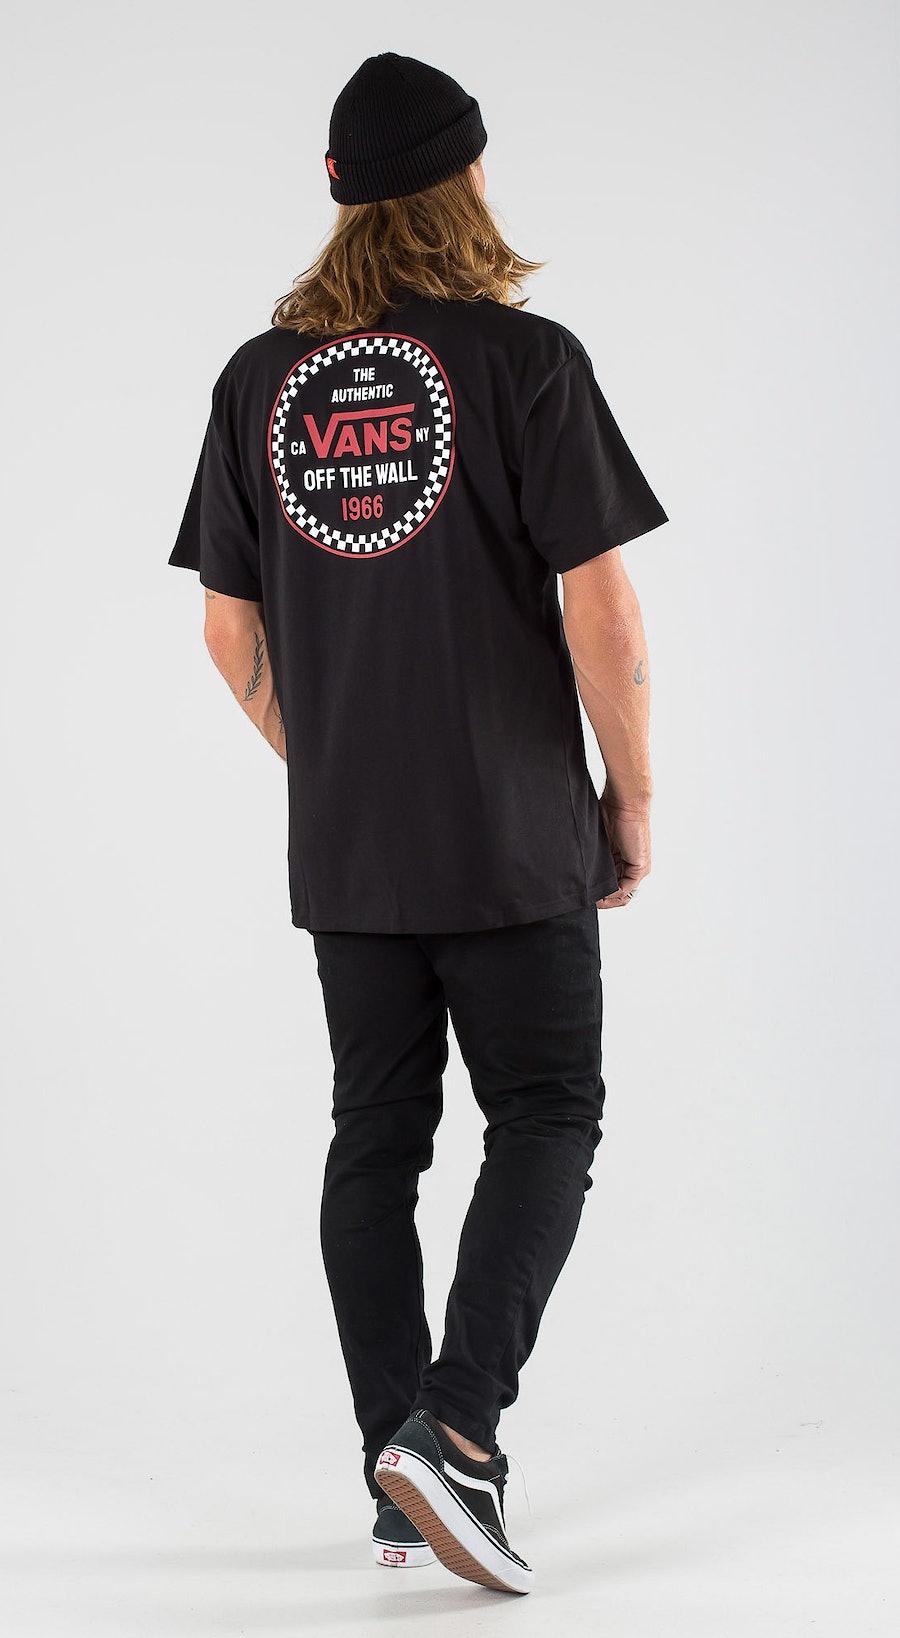 Vans Checker 66 Black Outfit Multi